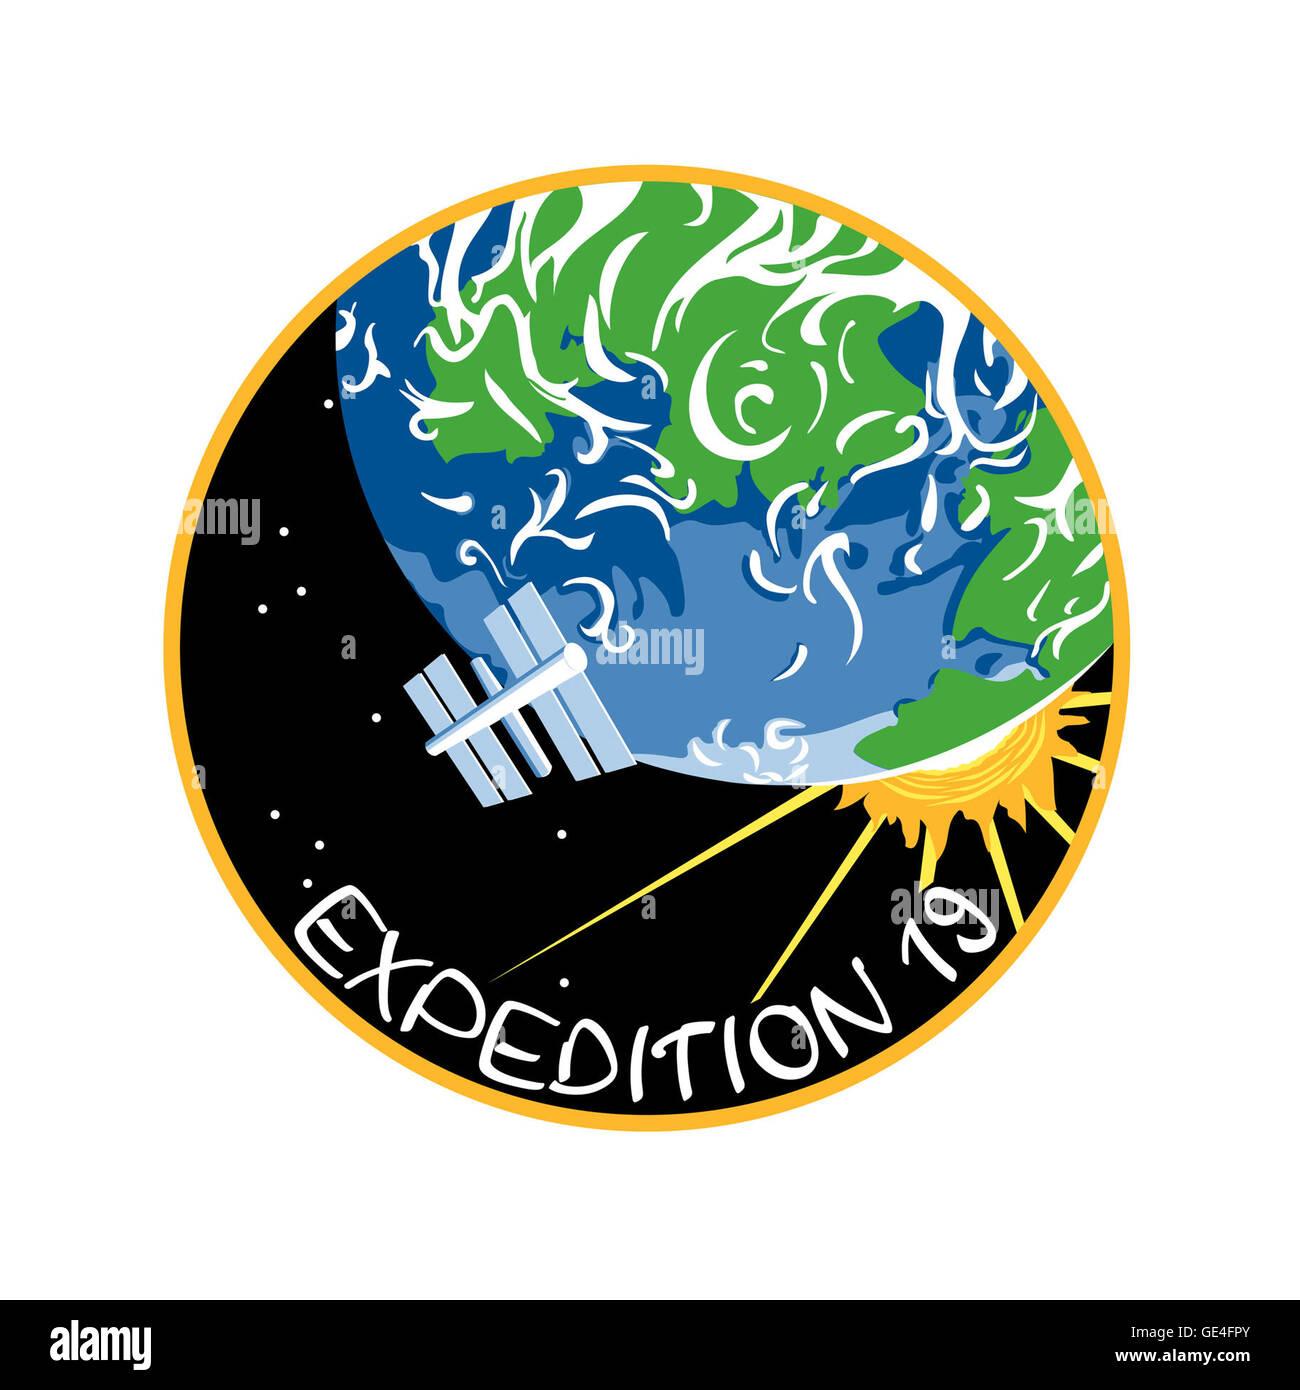 Launch: Soyuz TMA-14 March 26, 2009 Landing: May 29, 2009 Astronauts: Gennady Padalka, Michael Barratt and Koichi - Stock Image